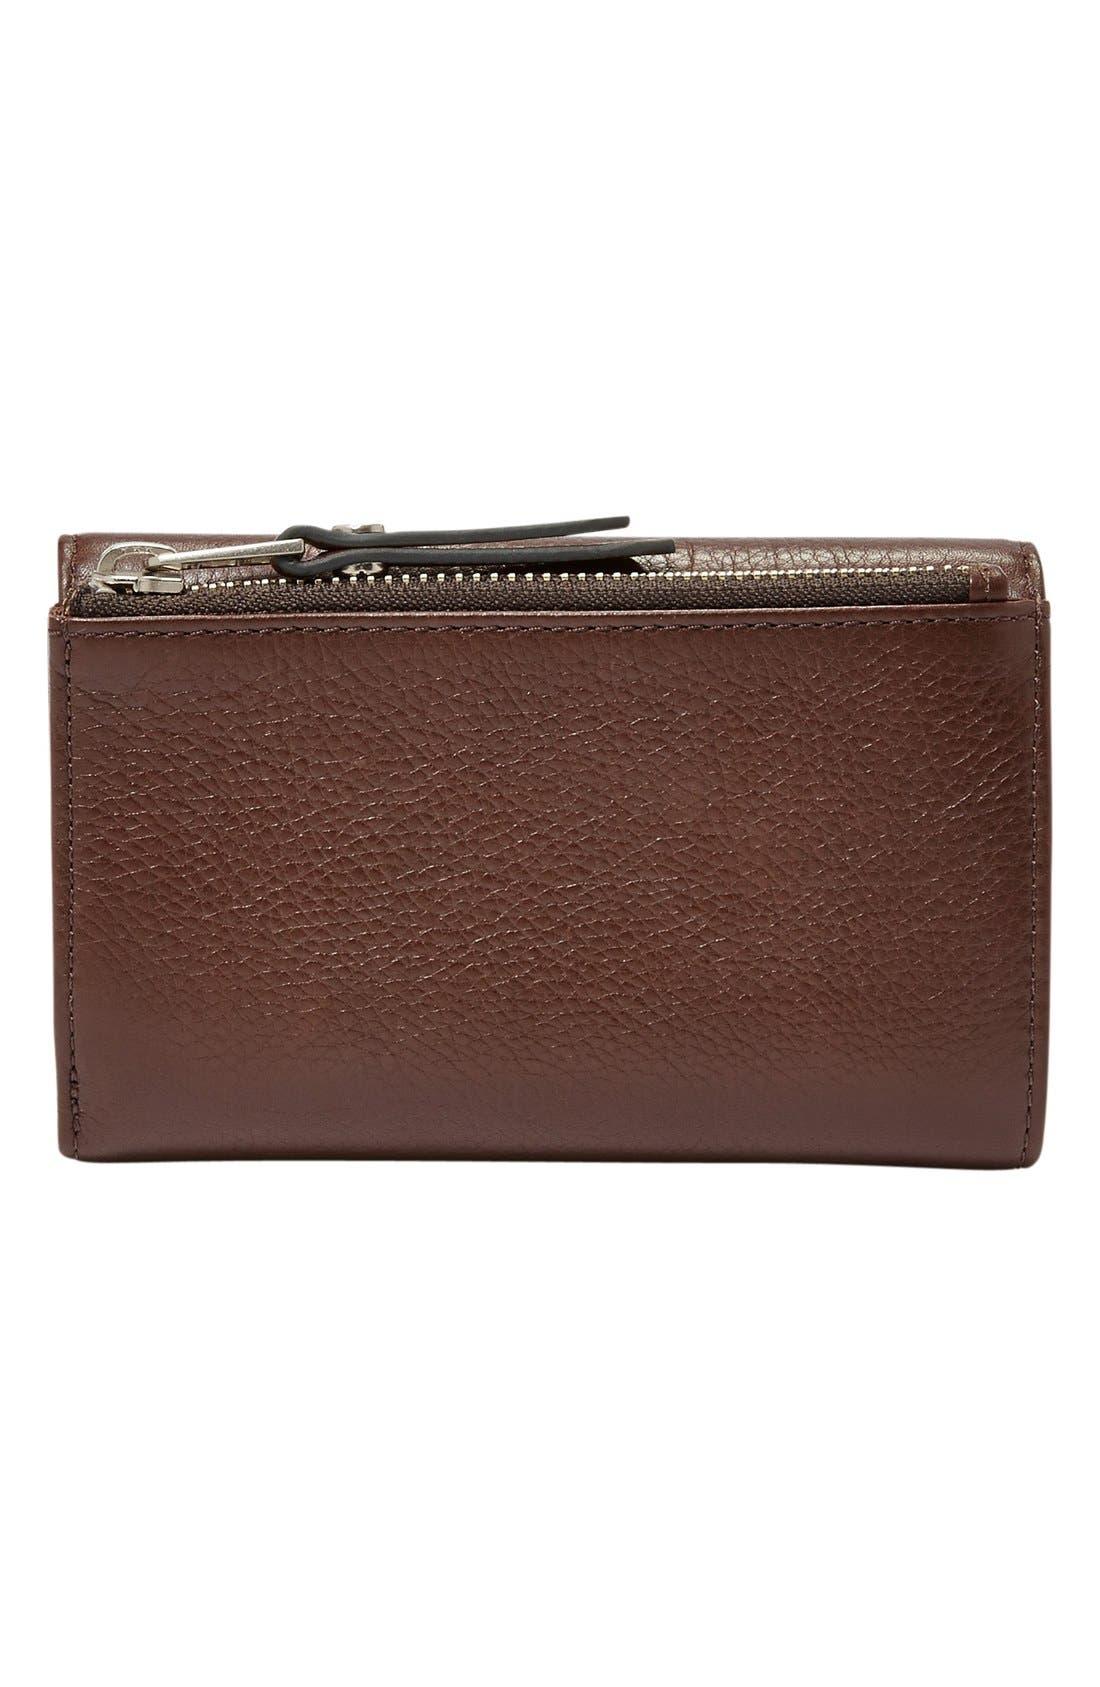 Alternate Image 3  - Fossil 'Dawson' Flap Wallet